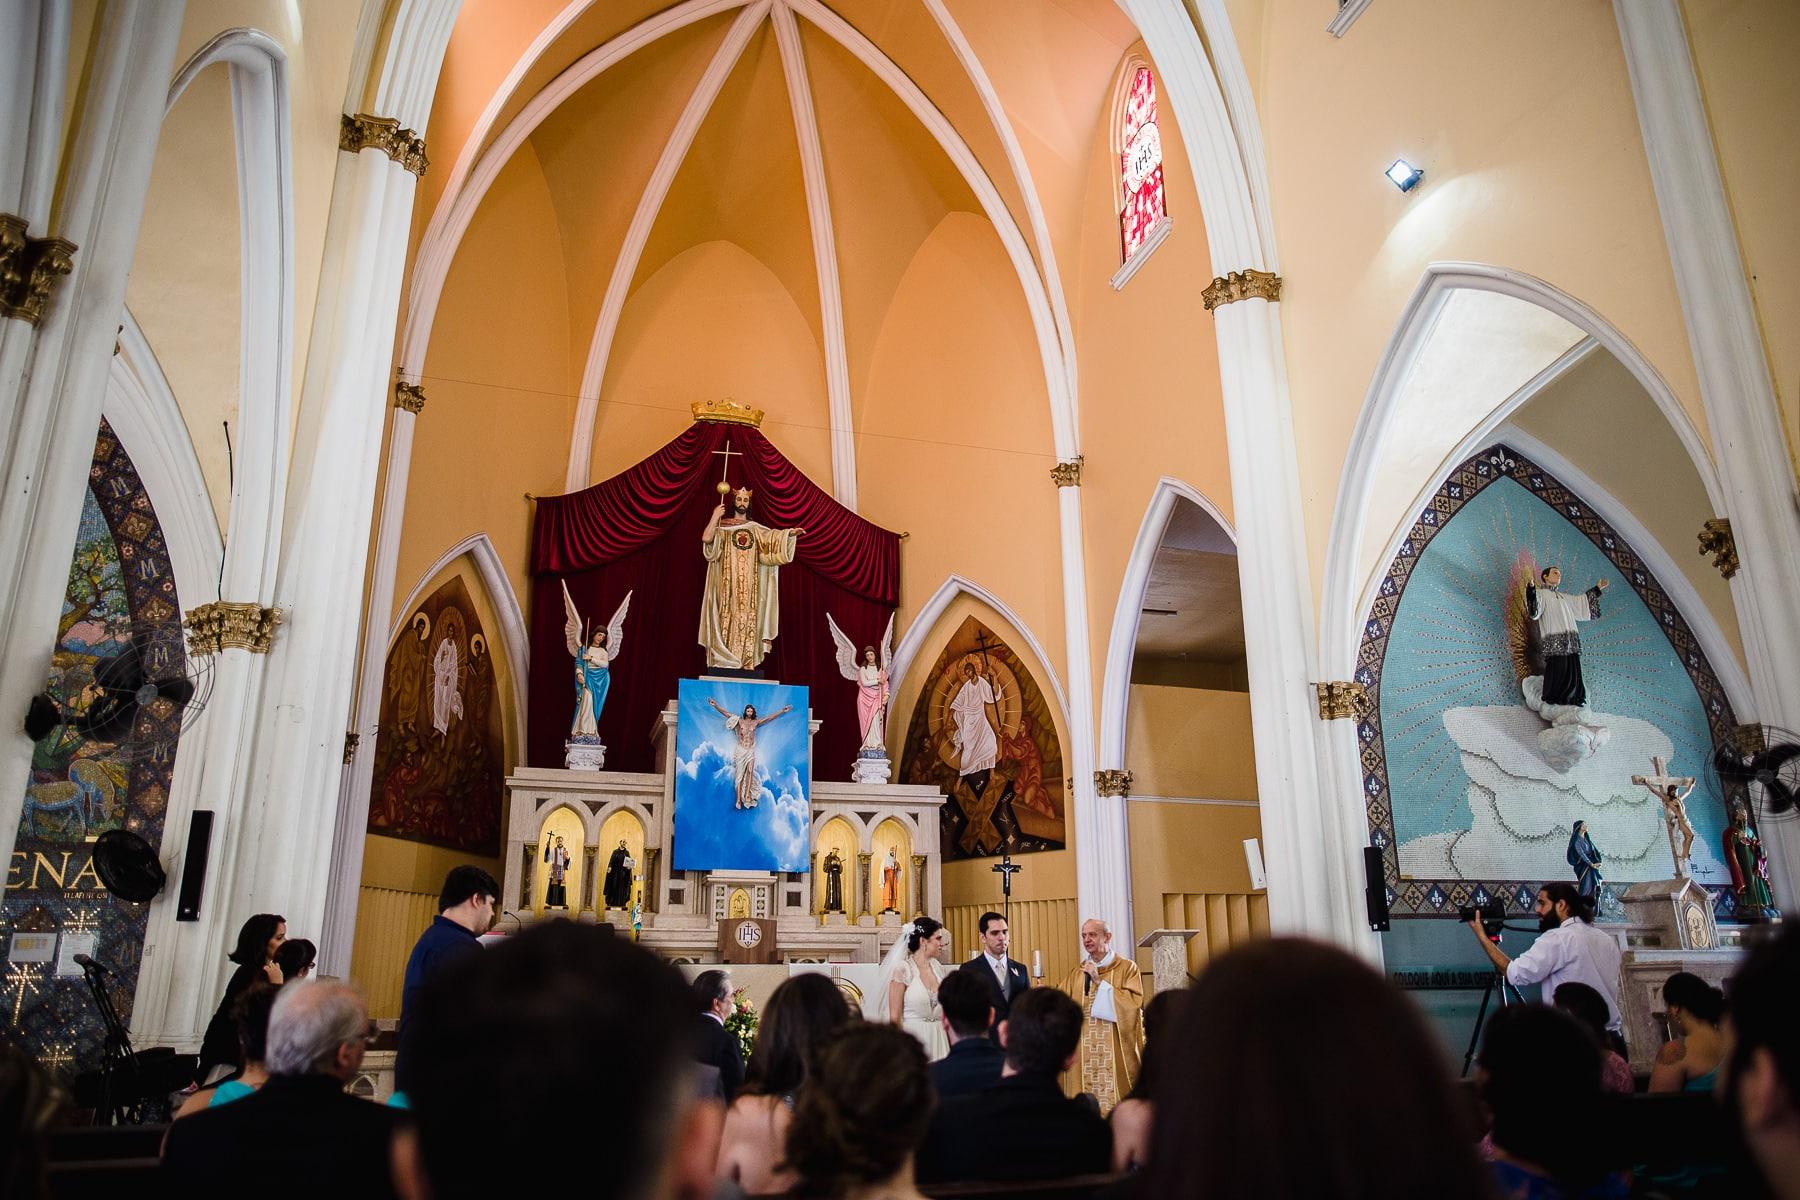 casamento-igreja-do-cristo-rei-fortaleza-39